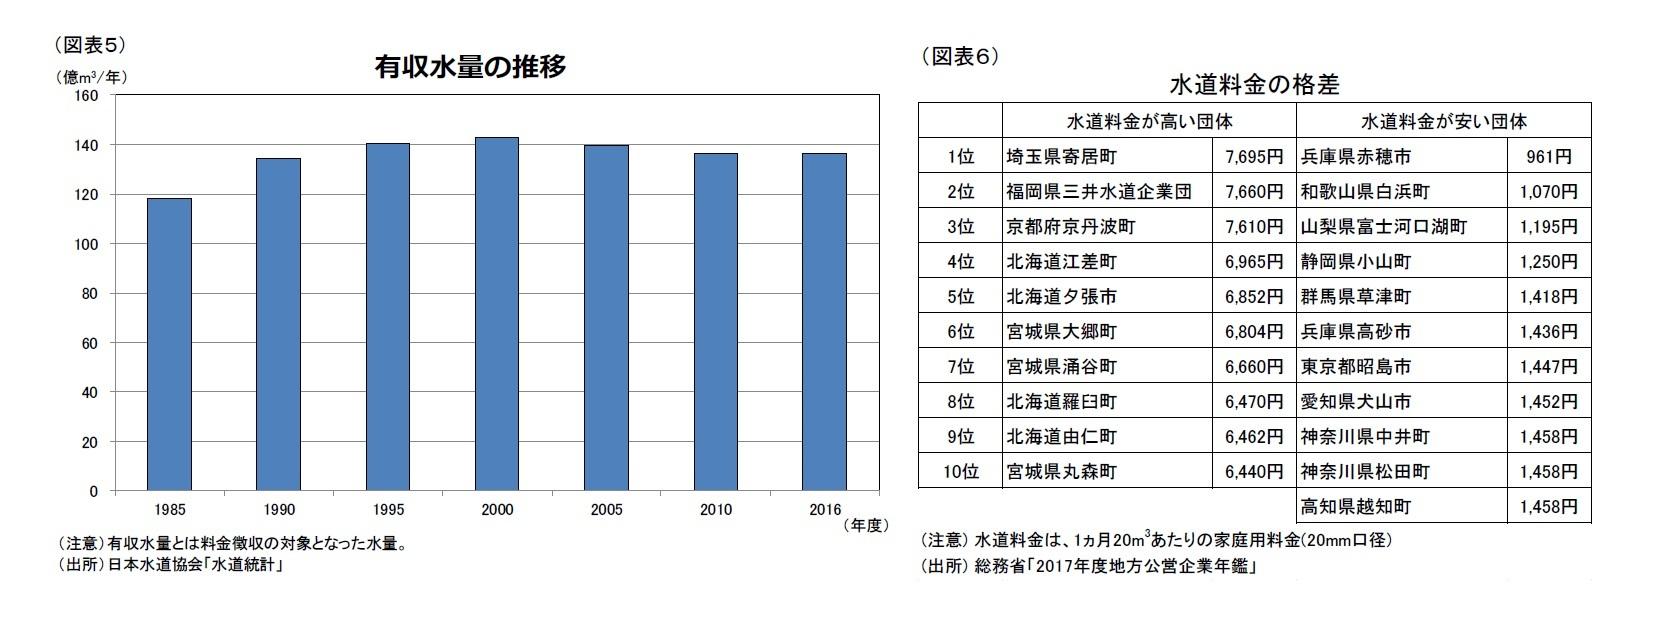 (図表5)有収水量の推移/(図表6)水道料金の格差